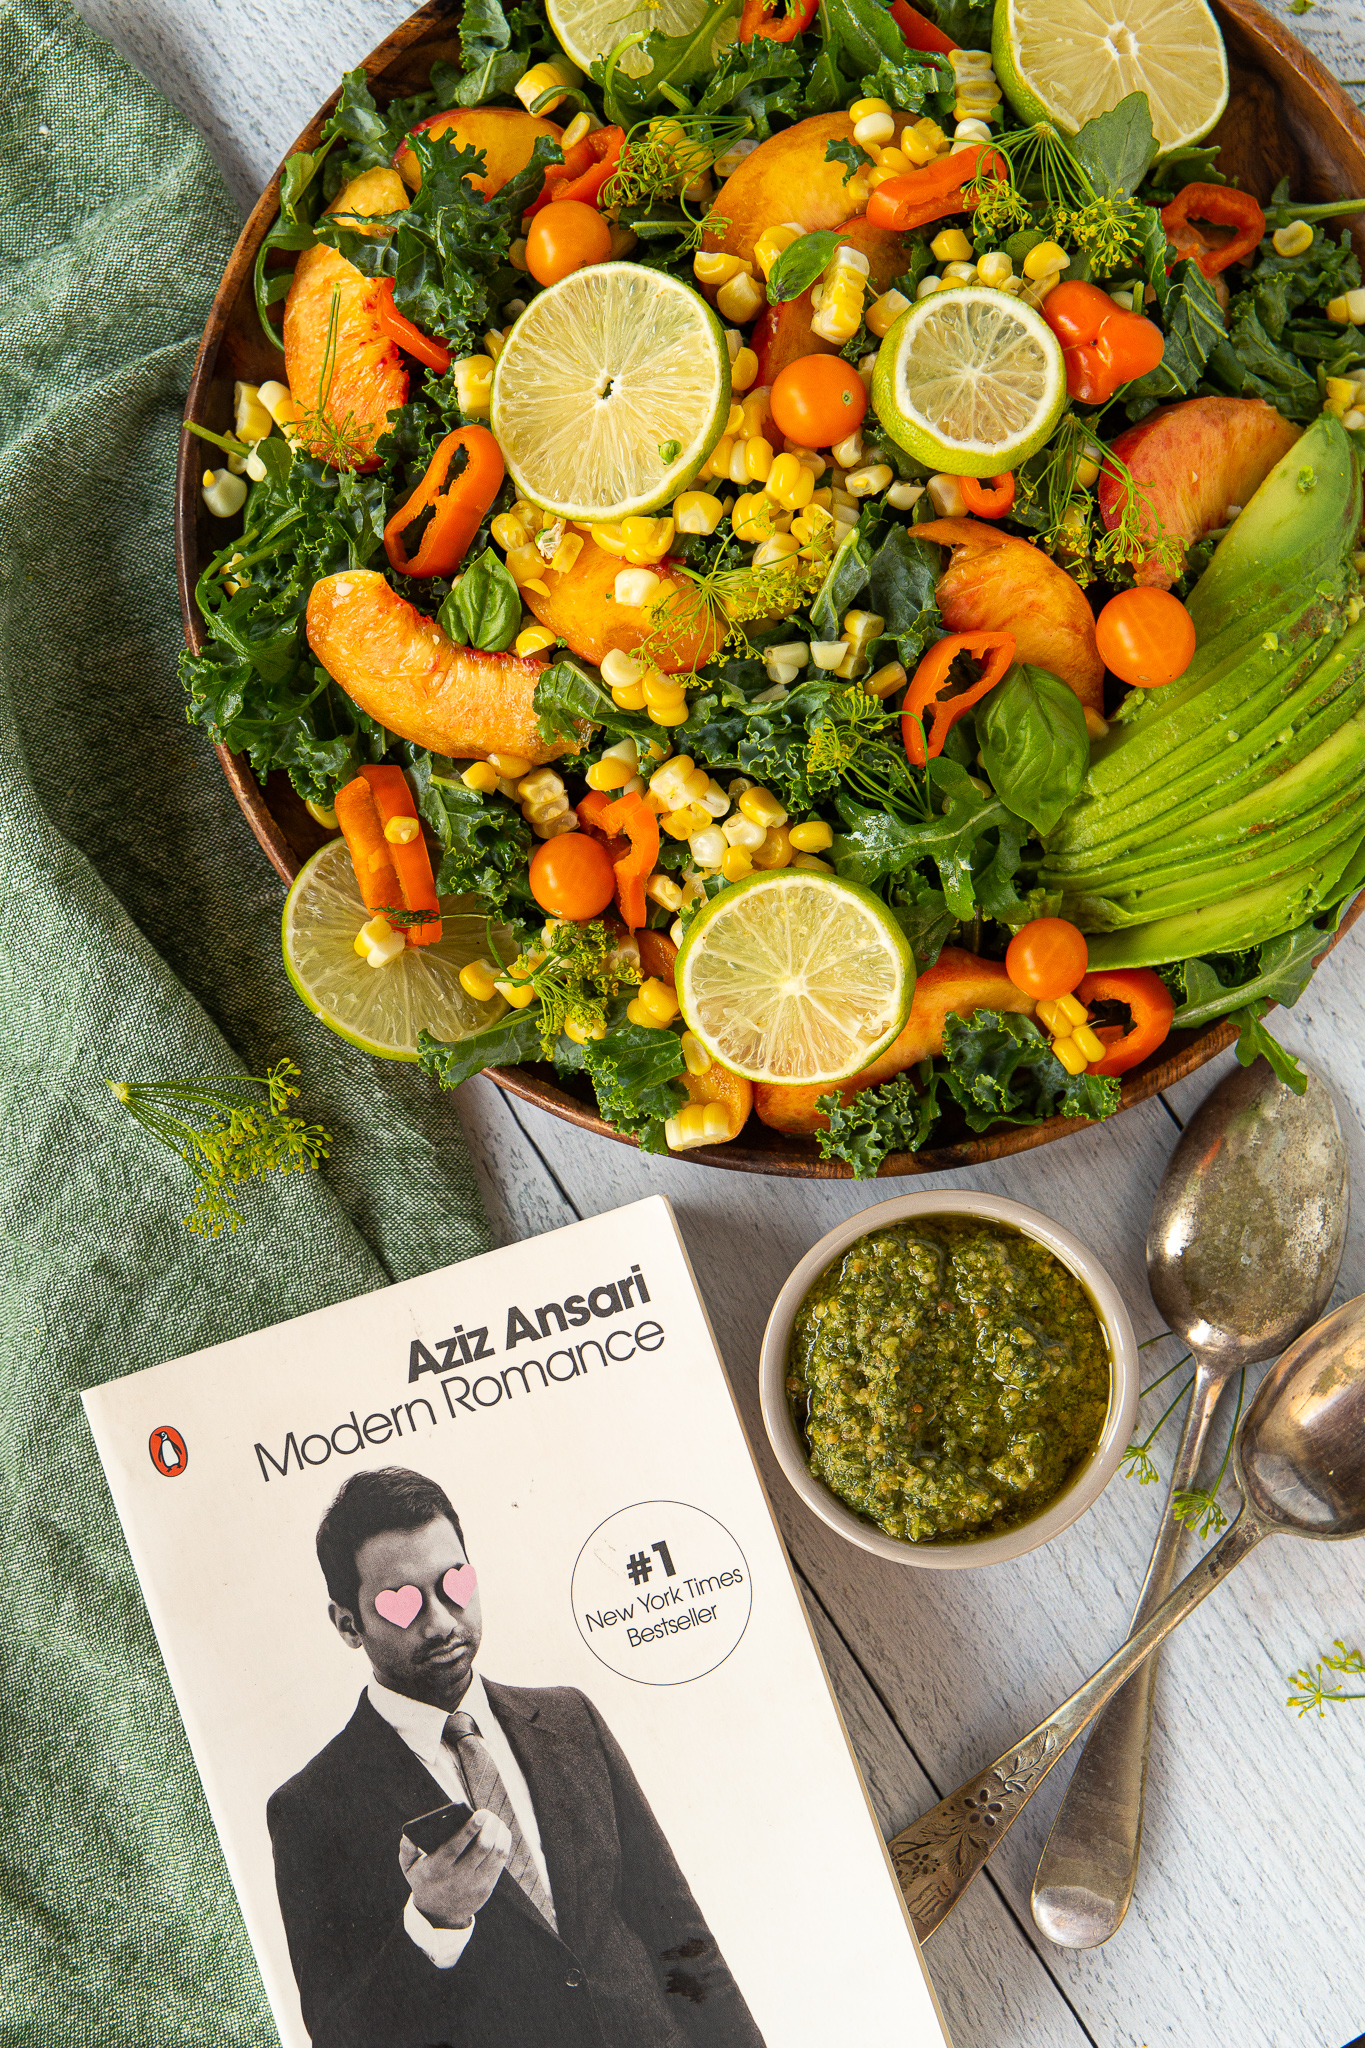 Roasted Corn and Pesto Salad and Modern Romance